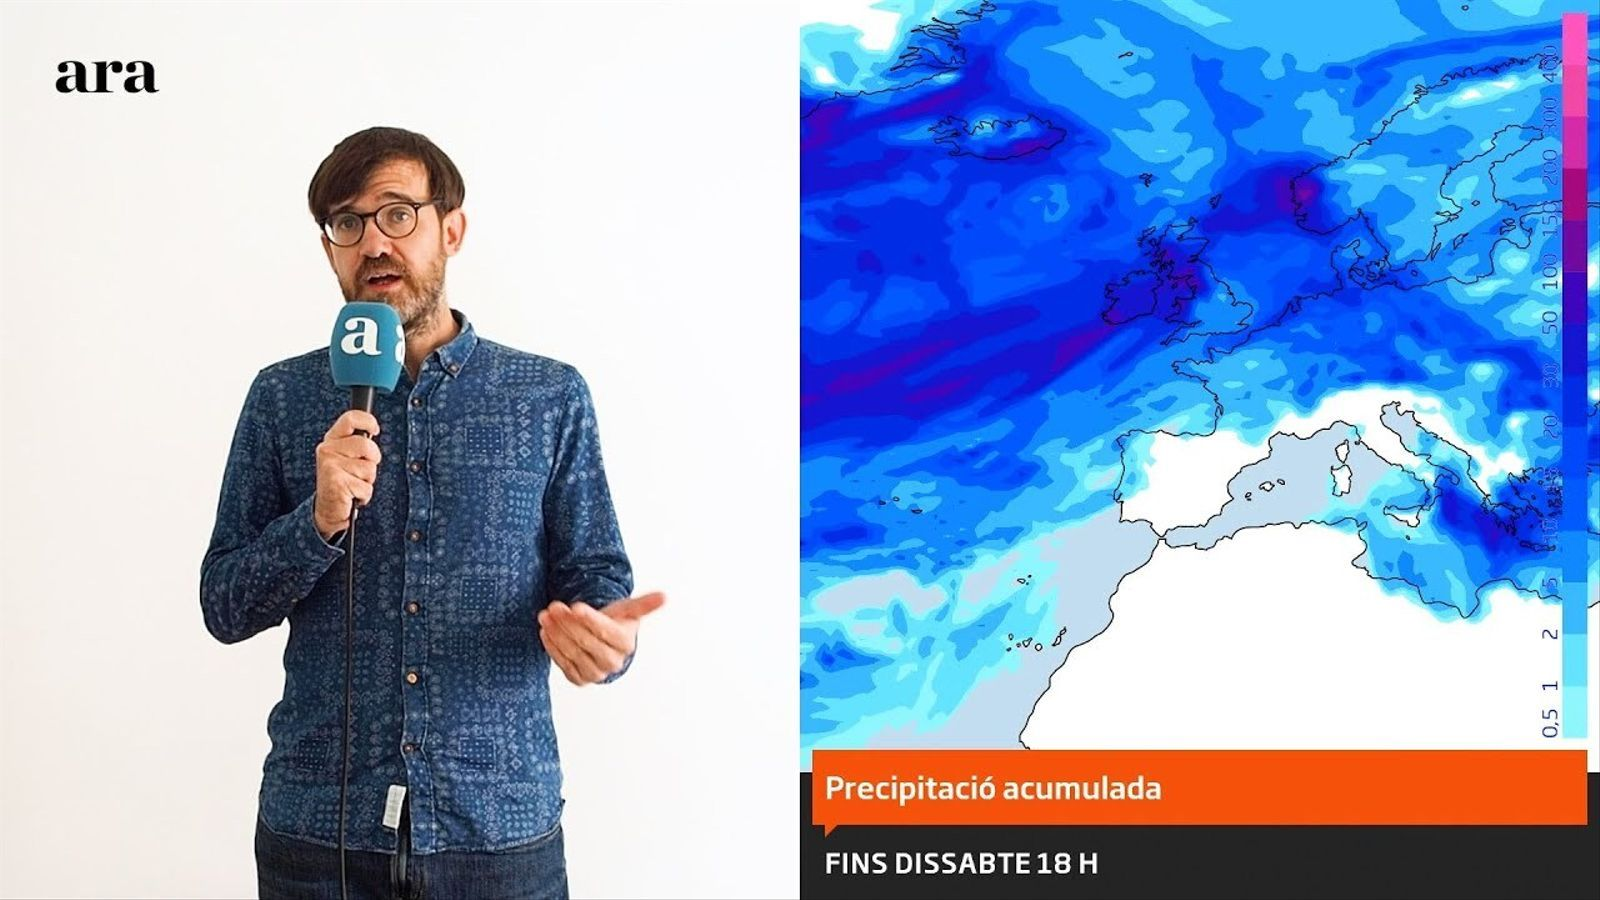 La méteo: migdies de gairebé 25 graus fins la setmana que ve